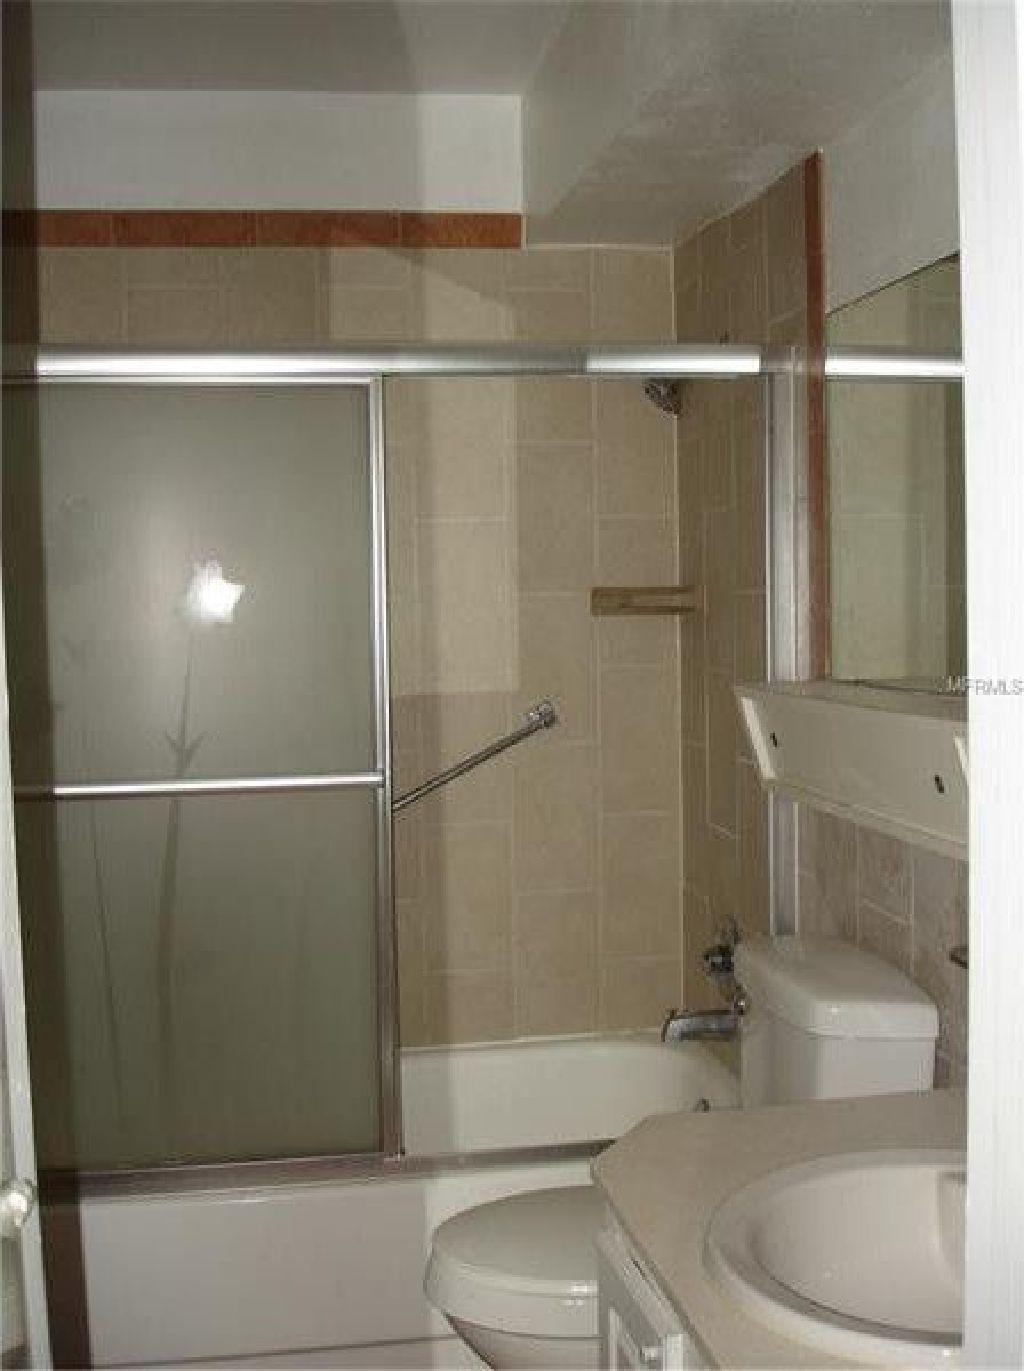 55+ community. Very nice remodeled 2 bedroom 2 bath on ground floor